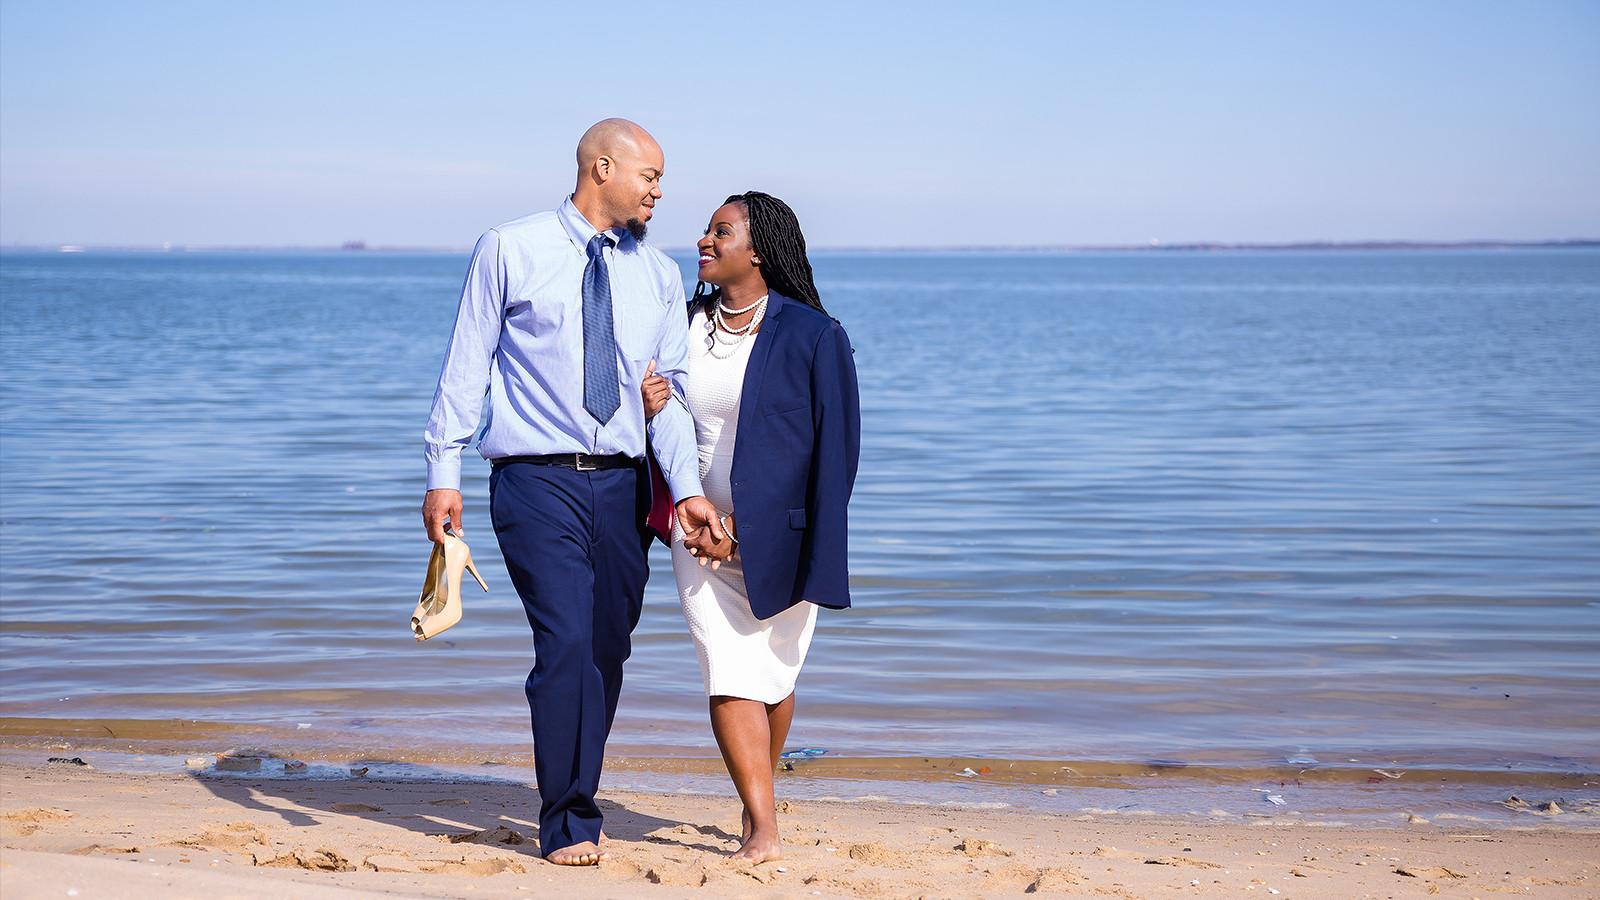 prewedding photos by the beach